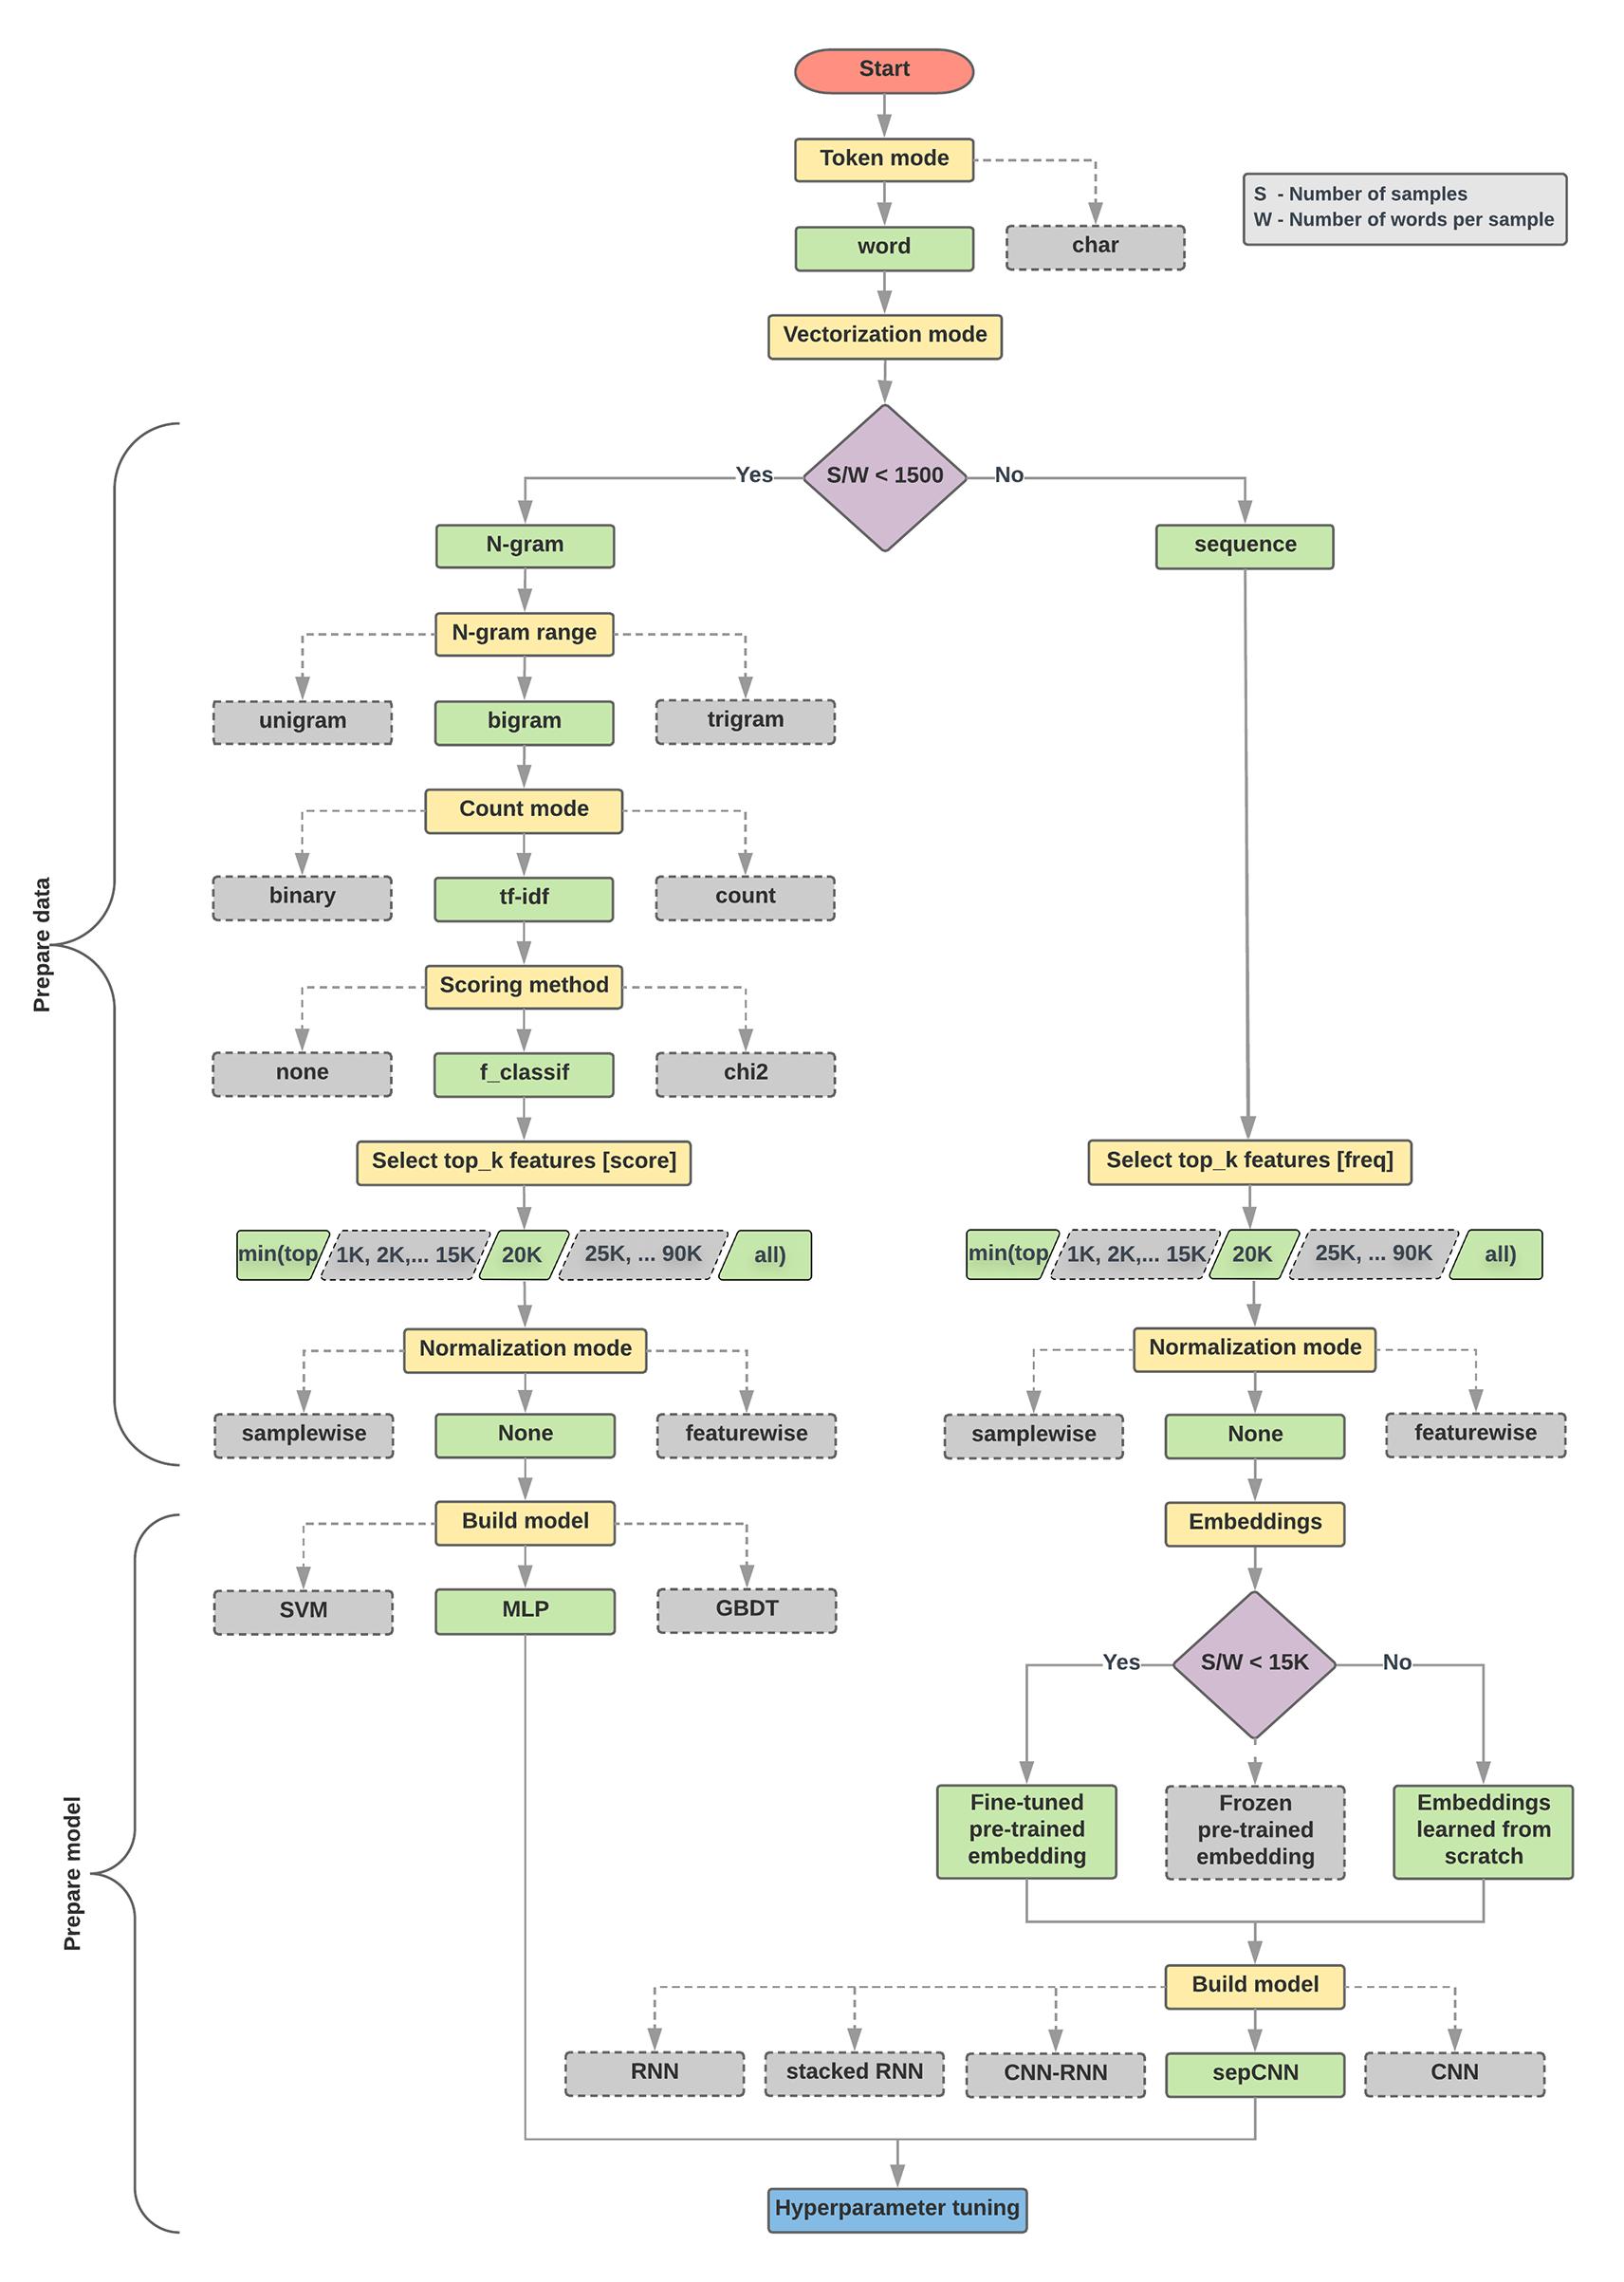 Text classification flowchart | AI/ML/DL, Data Science & Big